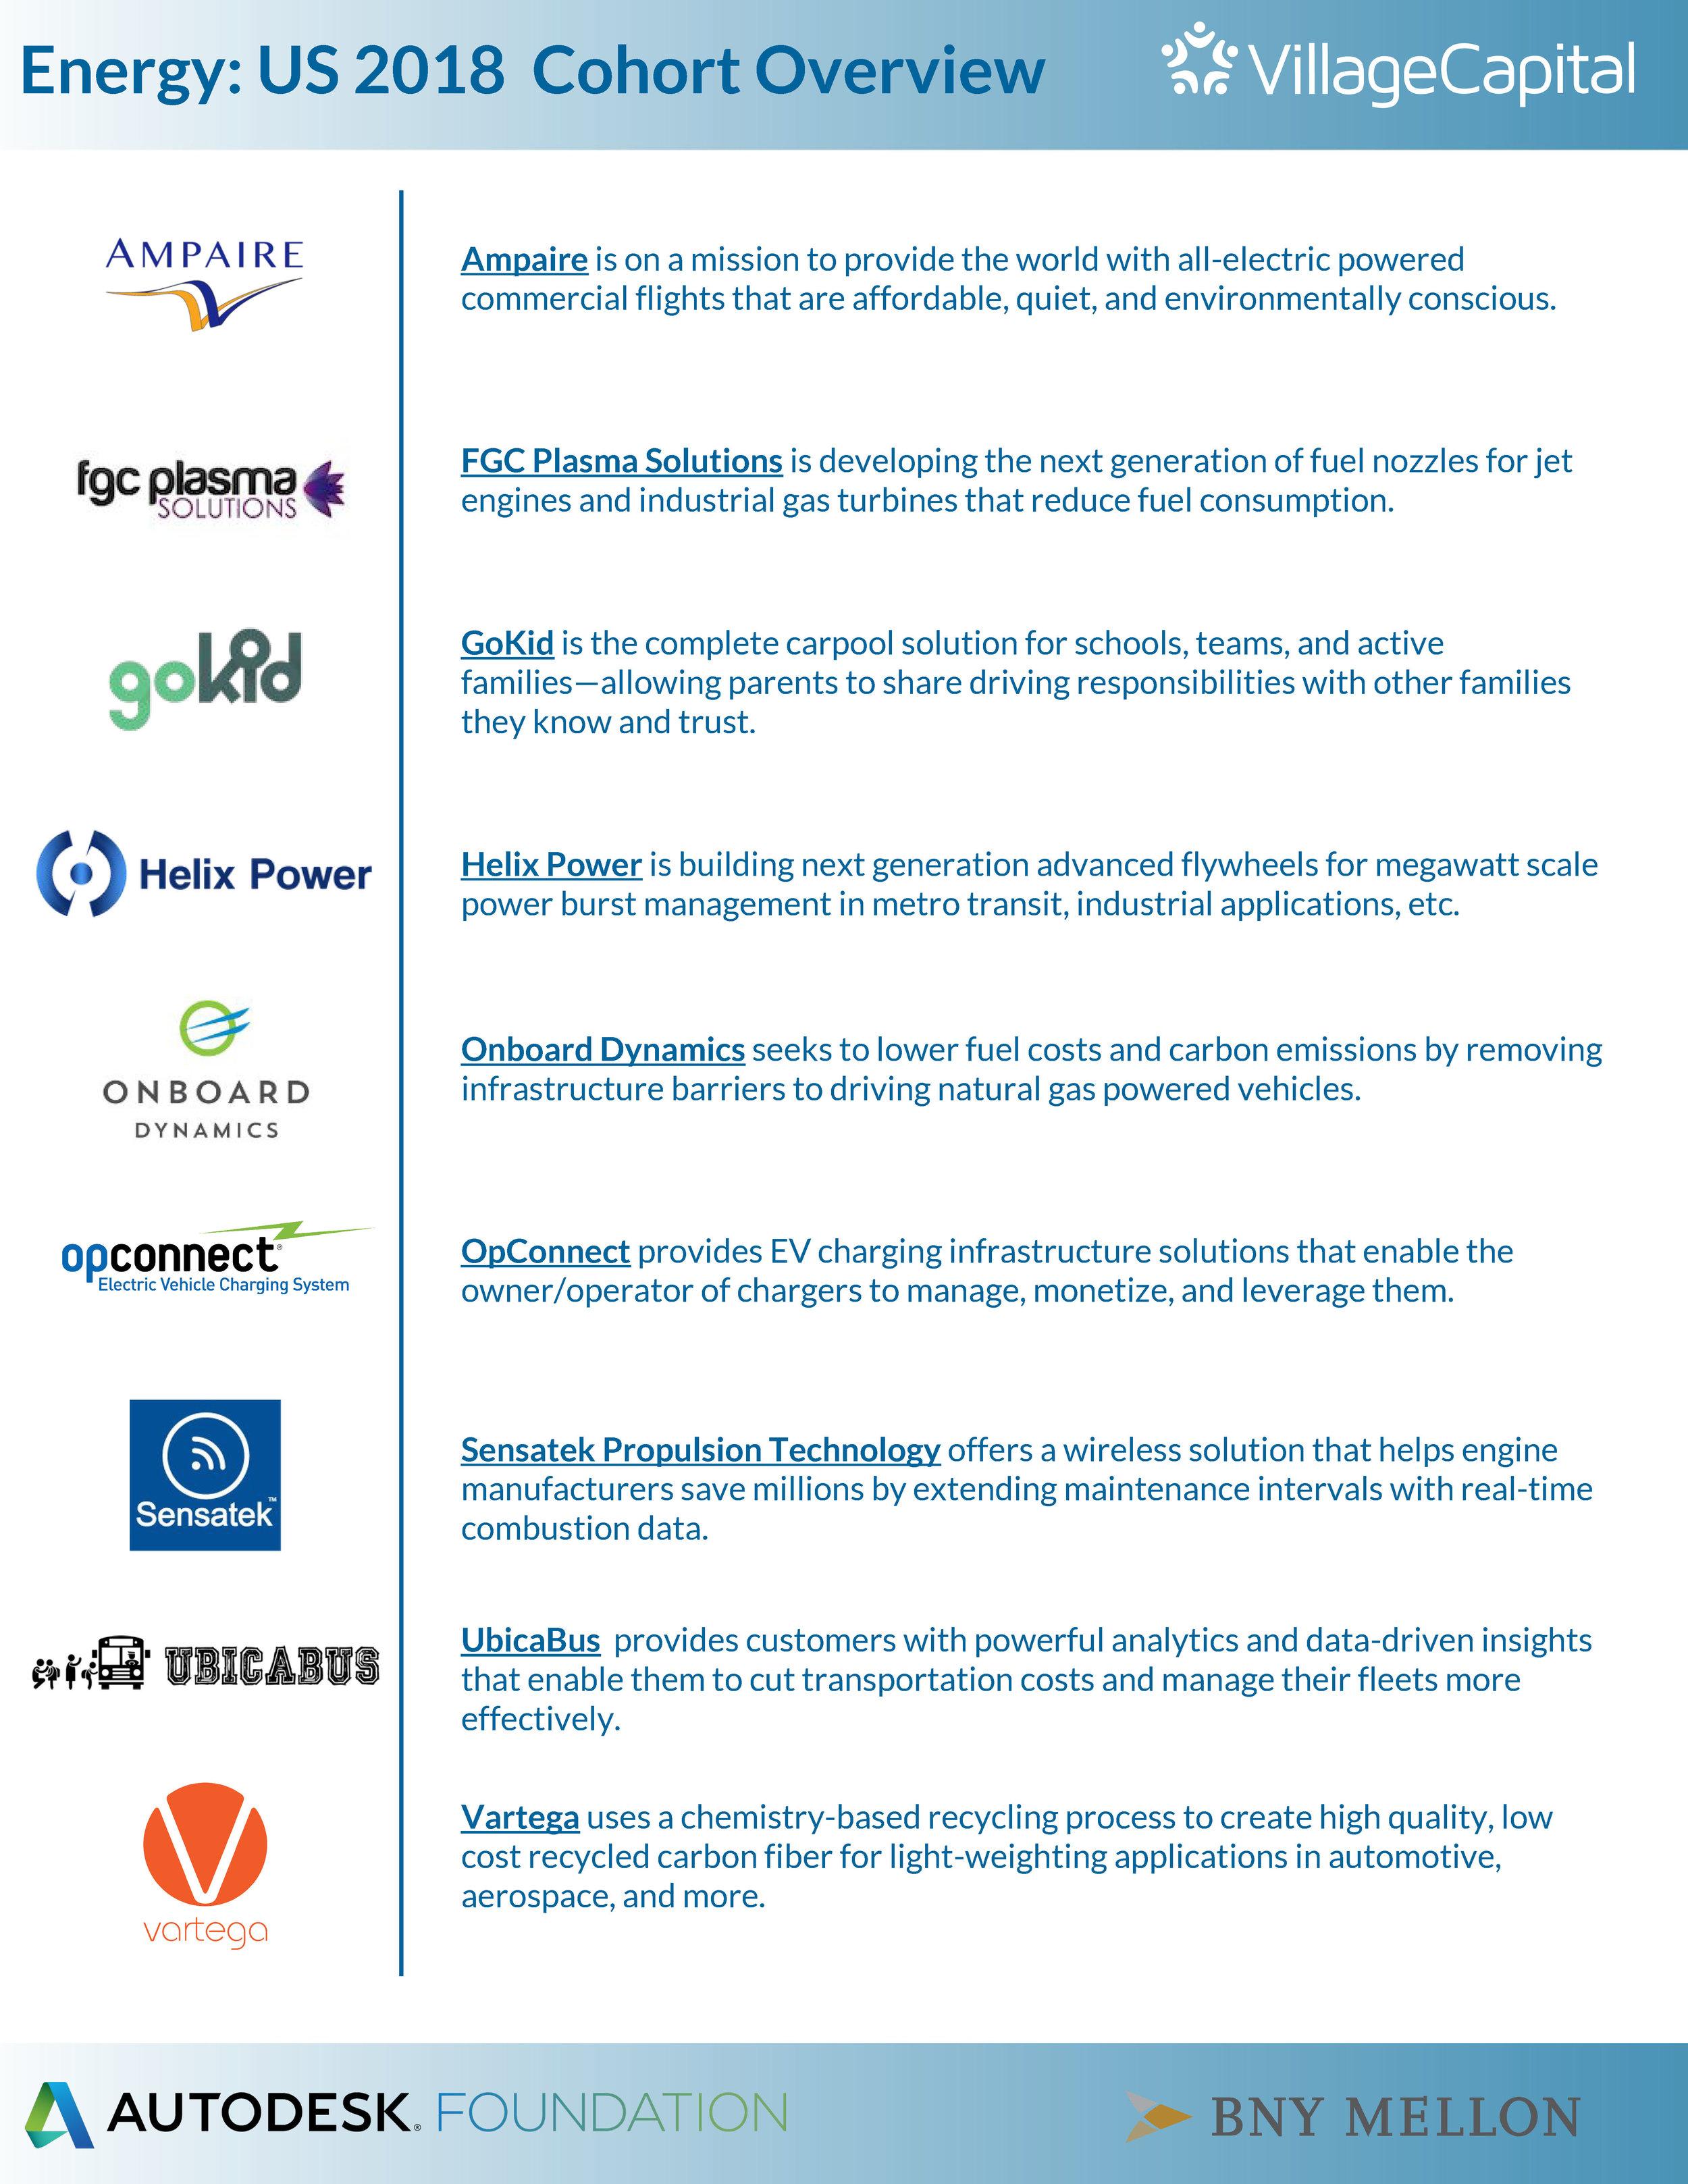 Energy 2018 Cohort Overview.jpg